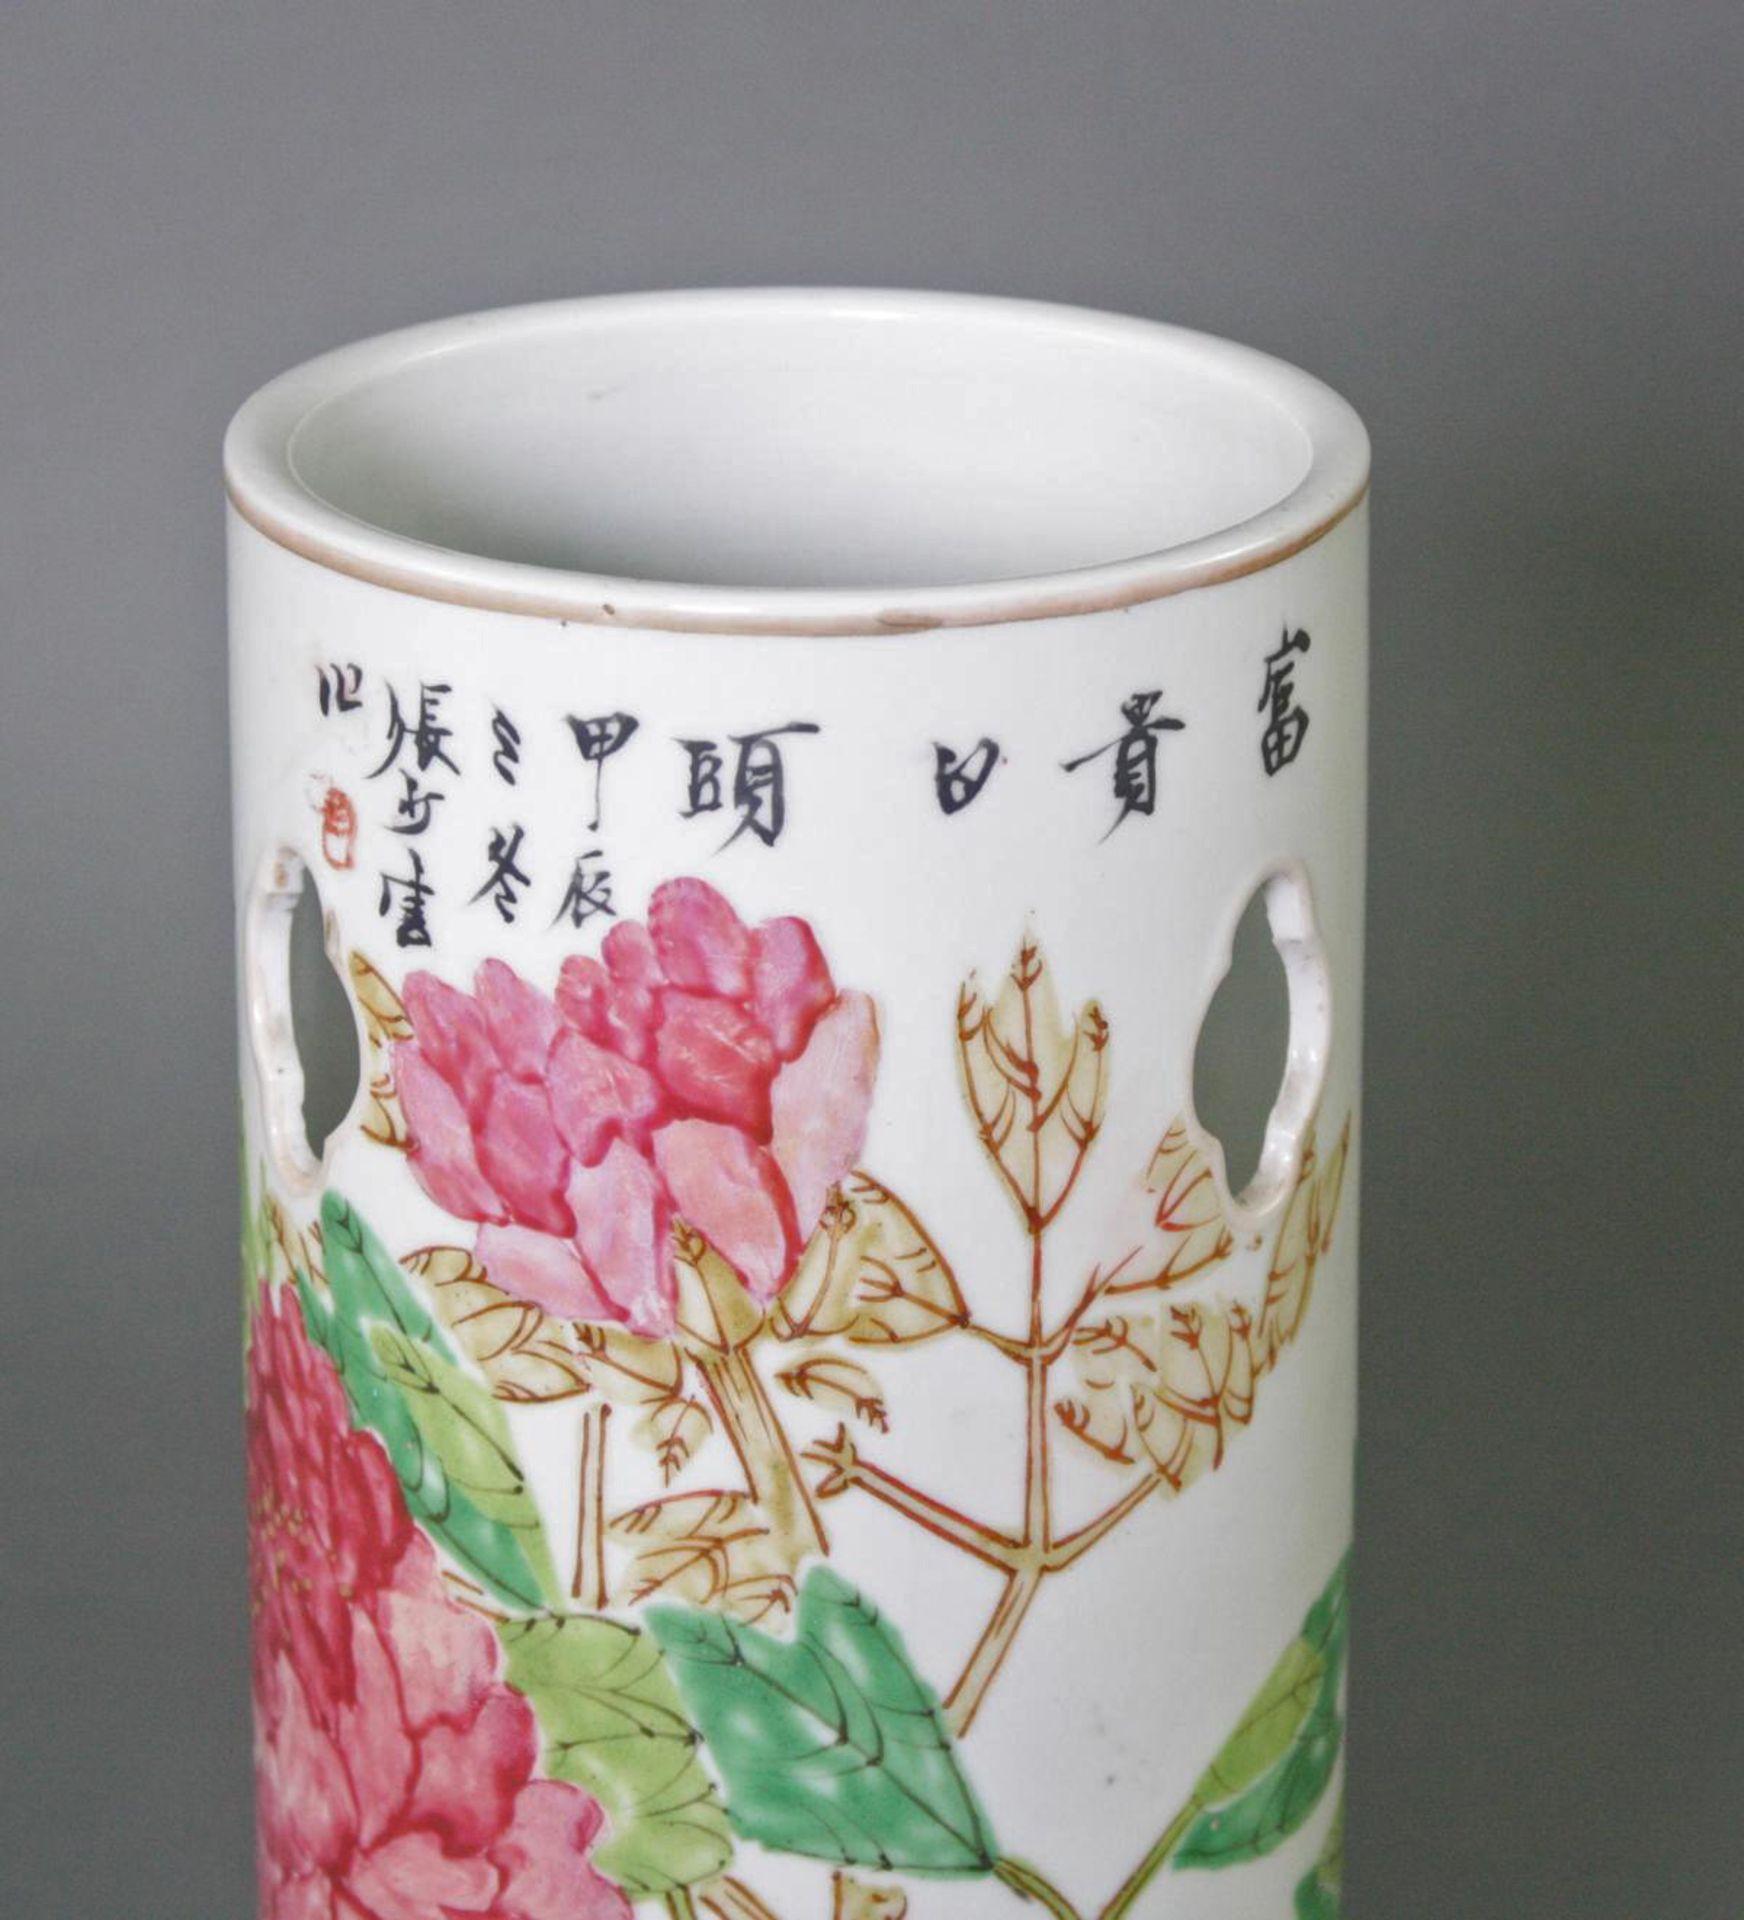 Hutständer, China Ende 19. Jahrhundert - Bild 5 aus 6